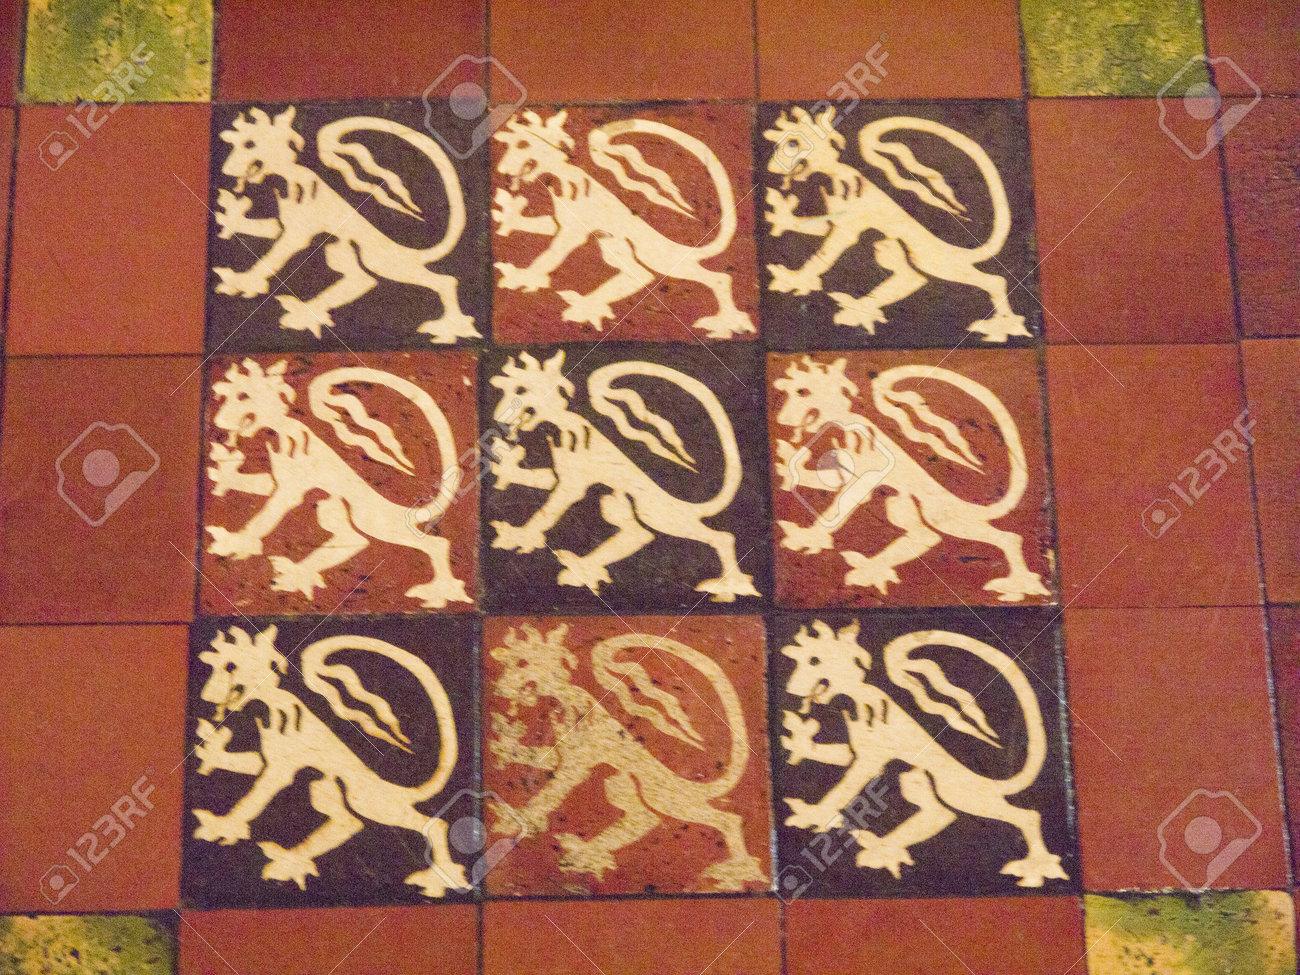 Medieval floor tiles choice image home flooring design antique floor tiles gallery tile flooring design ideas medieval floor tiles images tile flooring design ideas doublecrazyfo Image collections